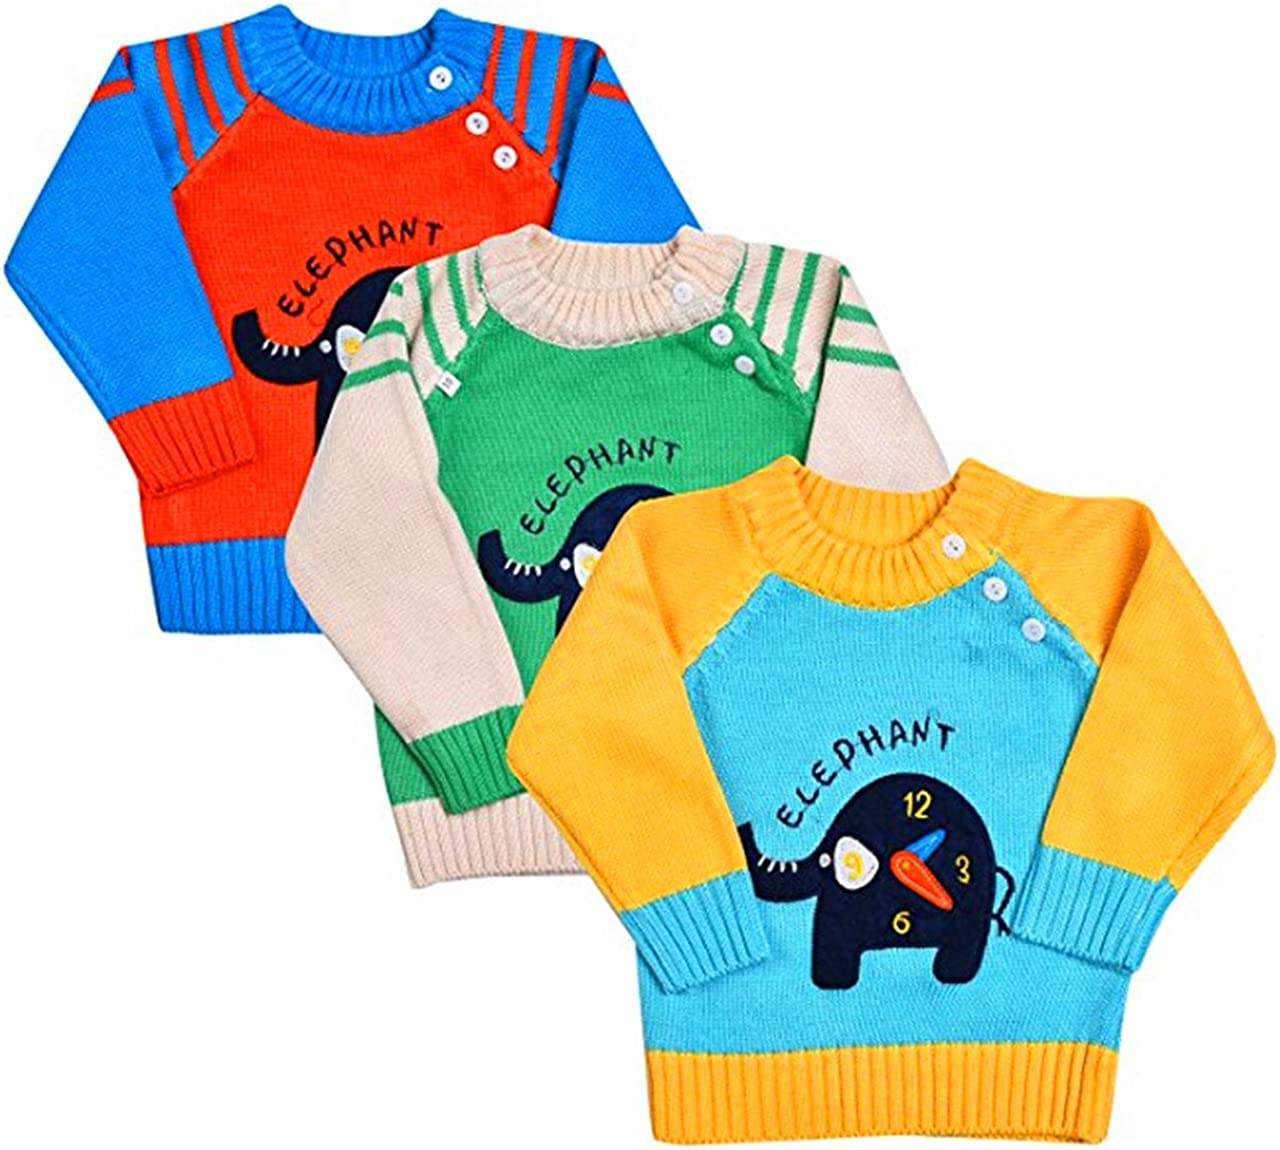 Kids Knitted Sweaters Baby Boys Girls Cartoon Jumpers Toddler Winter Sweatshirt Crewneck Long Sleeve Pullover